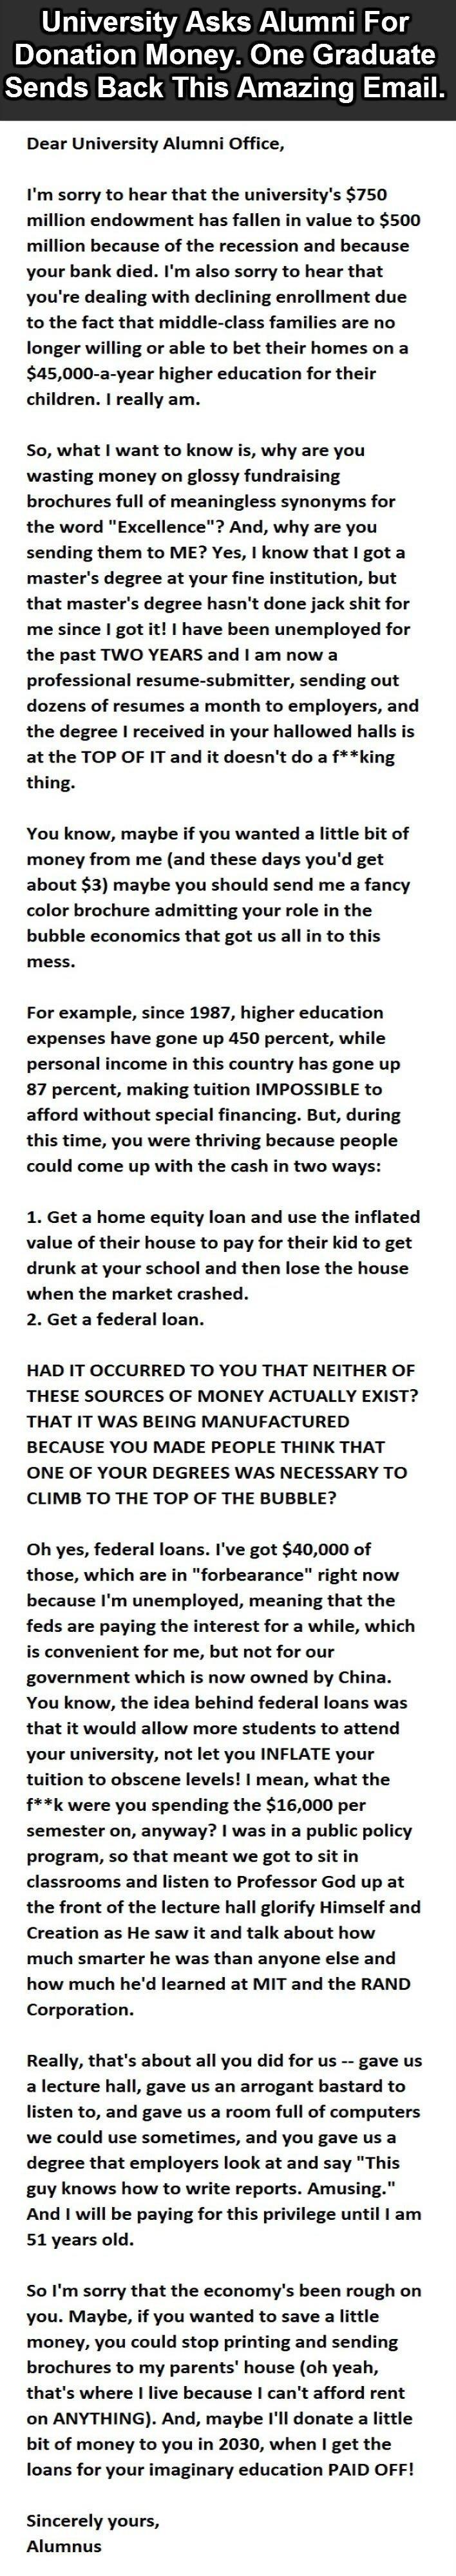 Alumni. . University Asks Alumni For Donation Money. One Graduate Sends Back This Amazing Email. Dear University Alumni Office, I' m sorry to hear that the univ